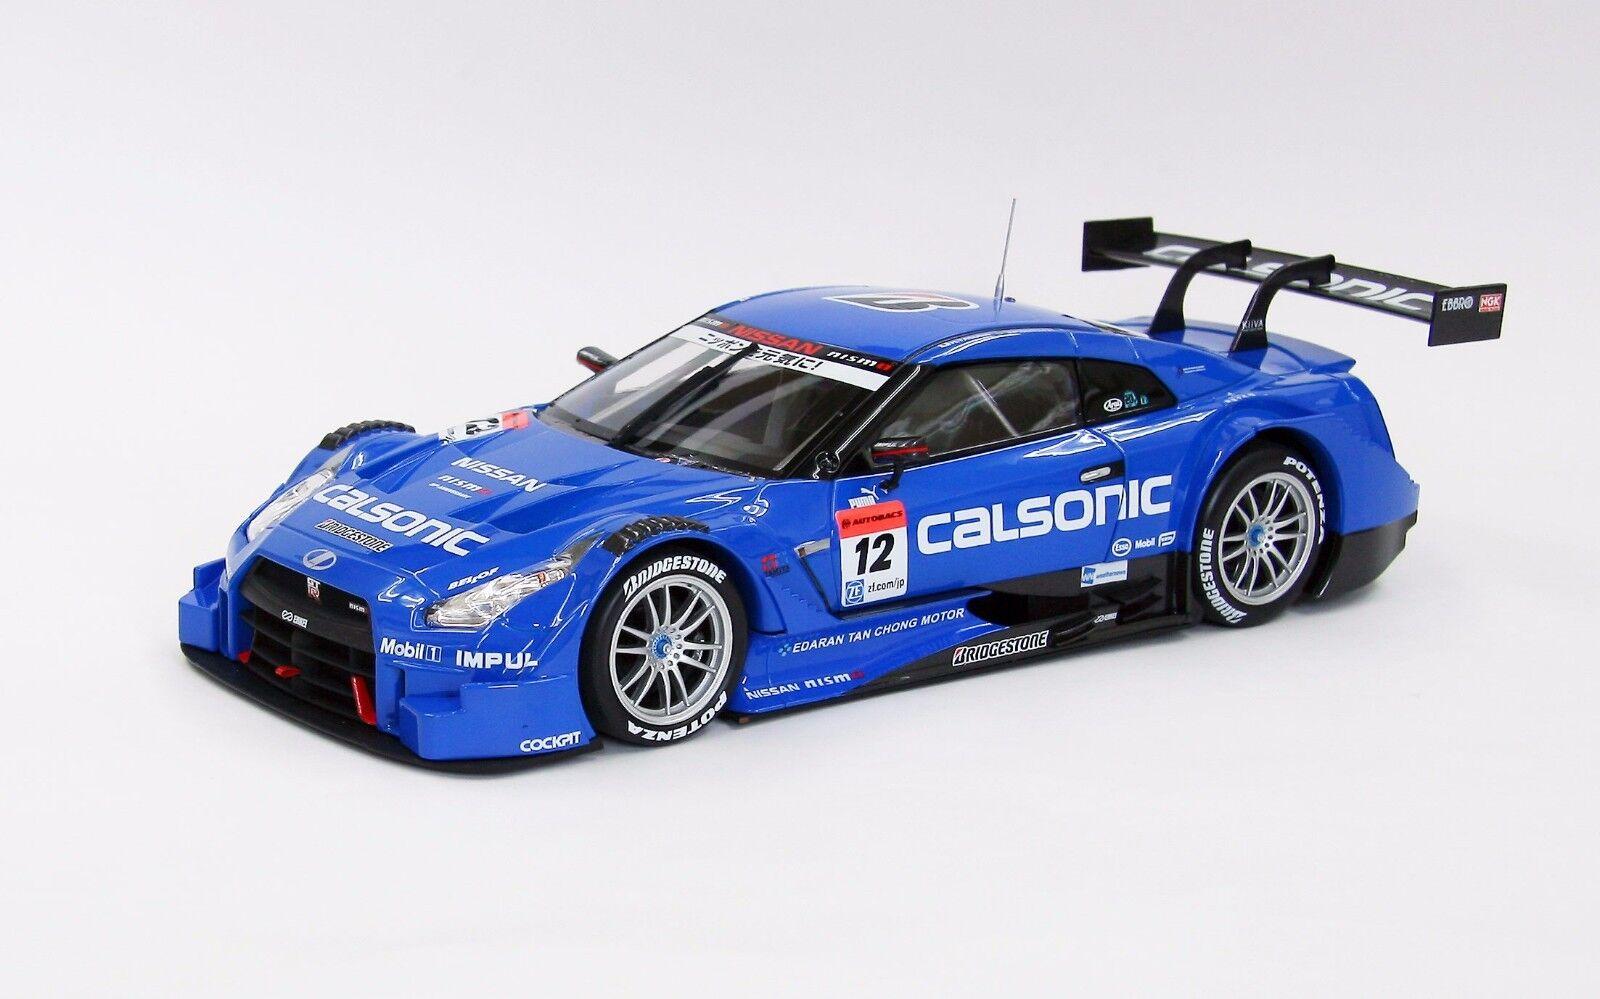 EBBRO 81017 1 18 Calsonic Impul Nissan Skyline GT-R R35 Fuji Winner 2014